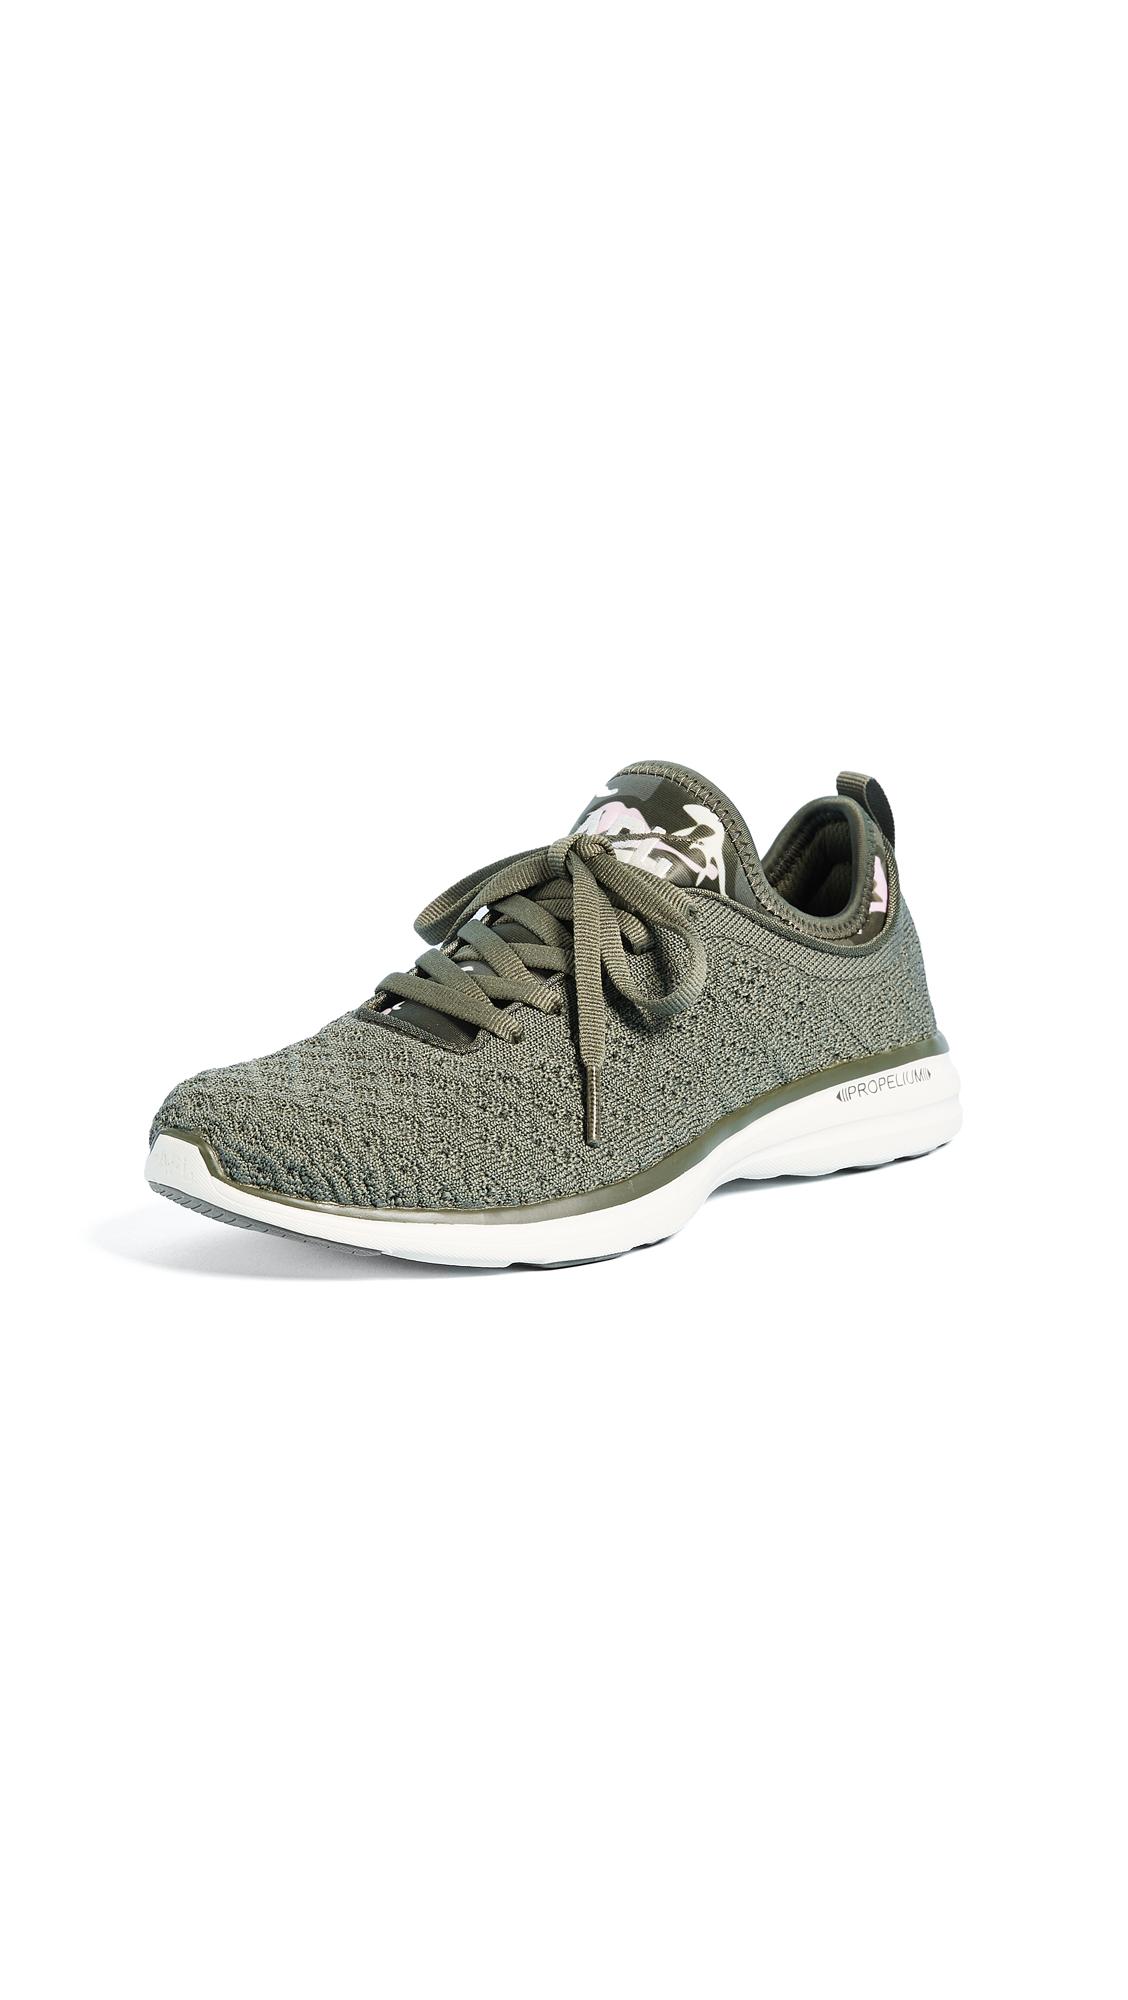 APL: Athletic Propulsion Labs TechLoom Phantom Sneakers - Fatigue/Pristine/Soft Pink